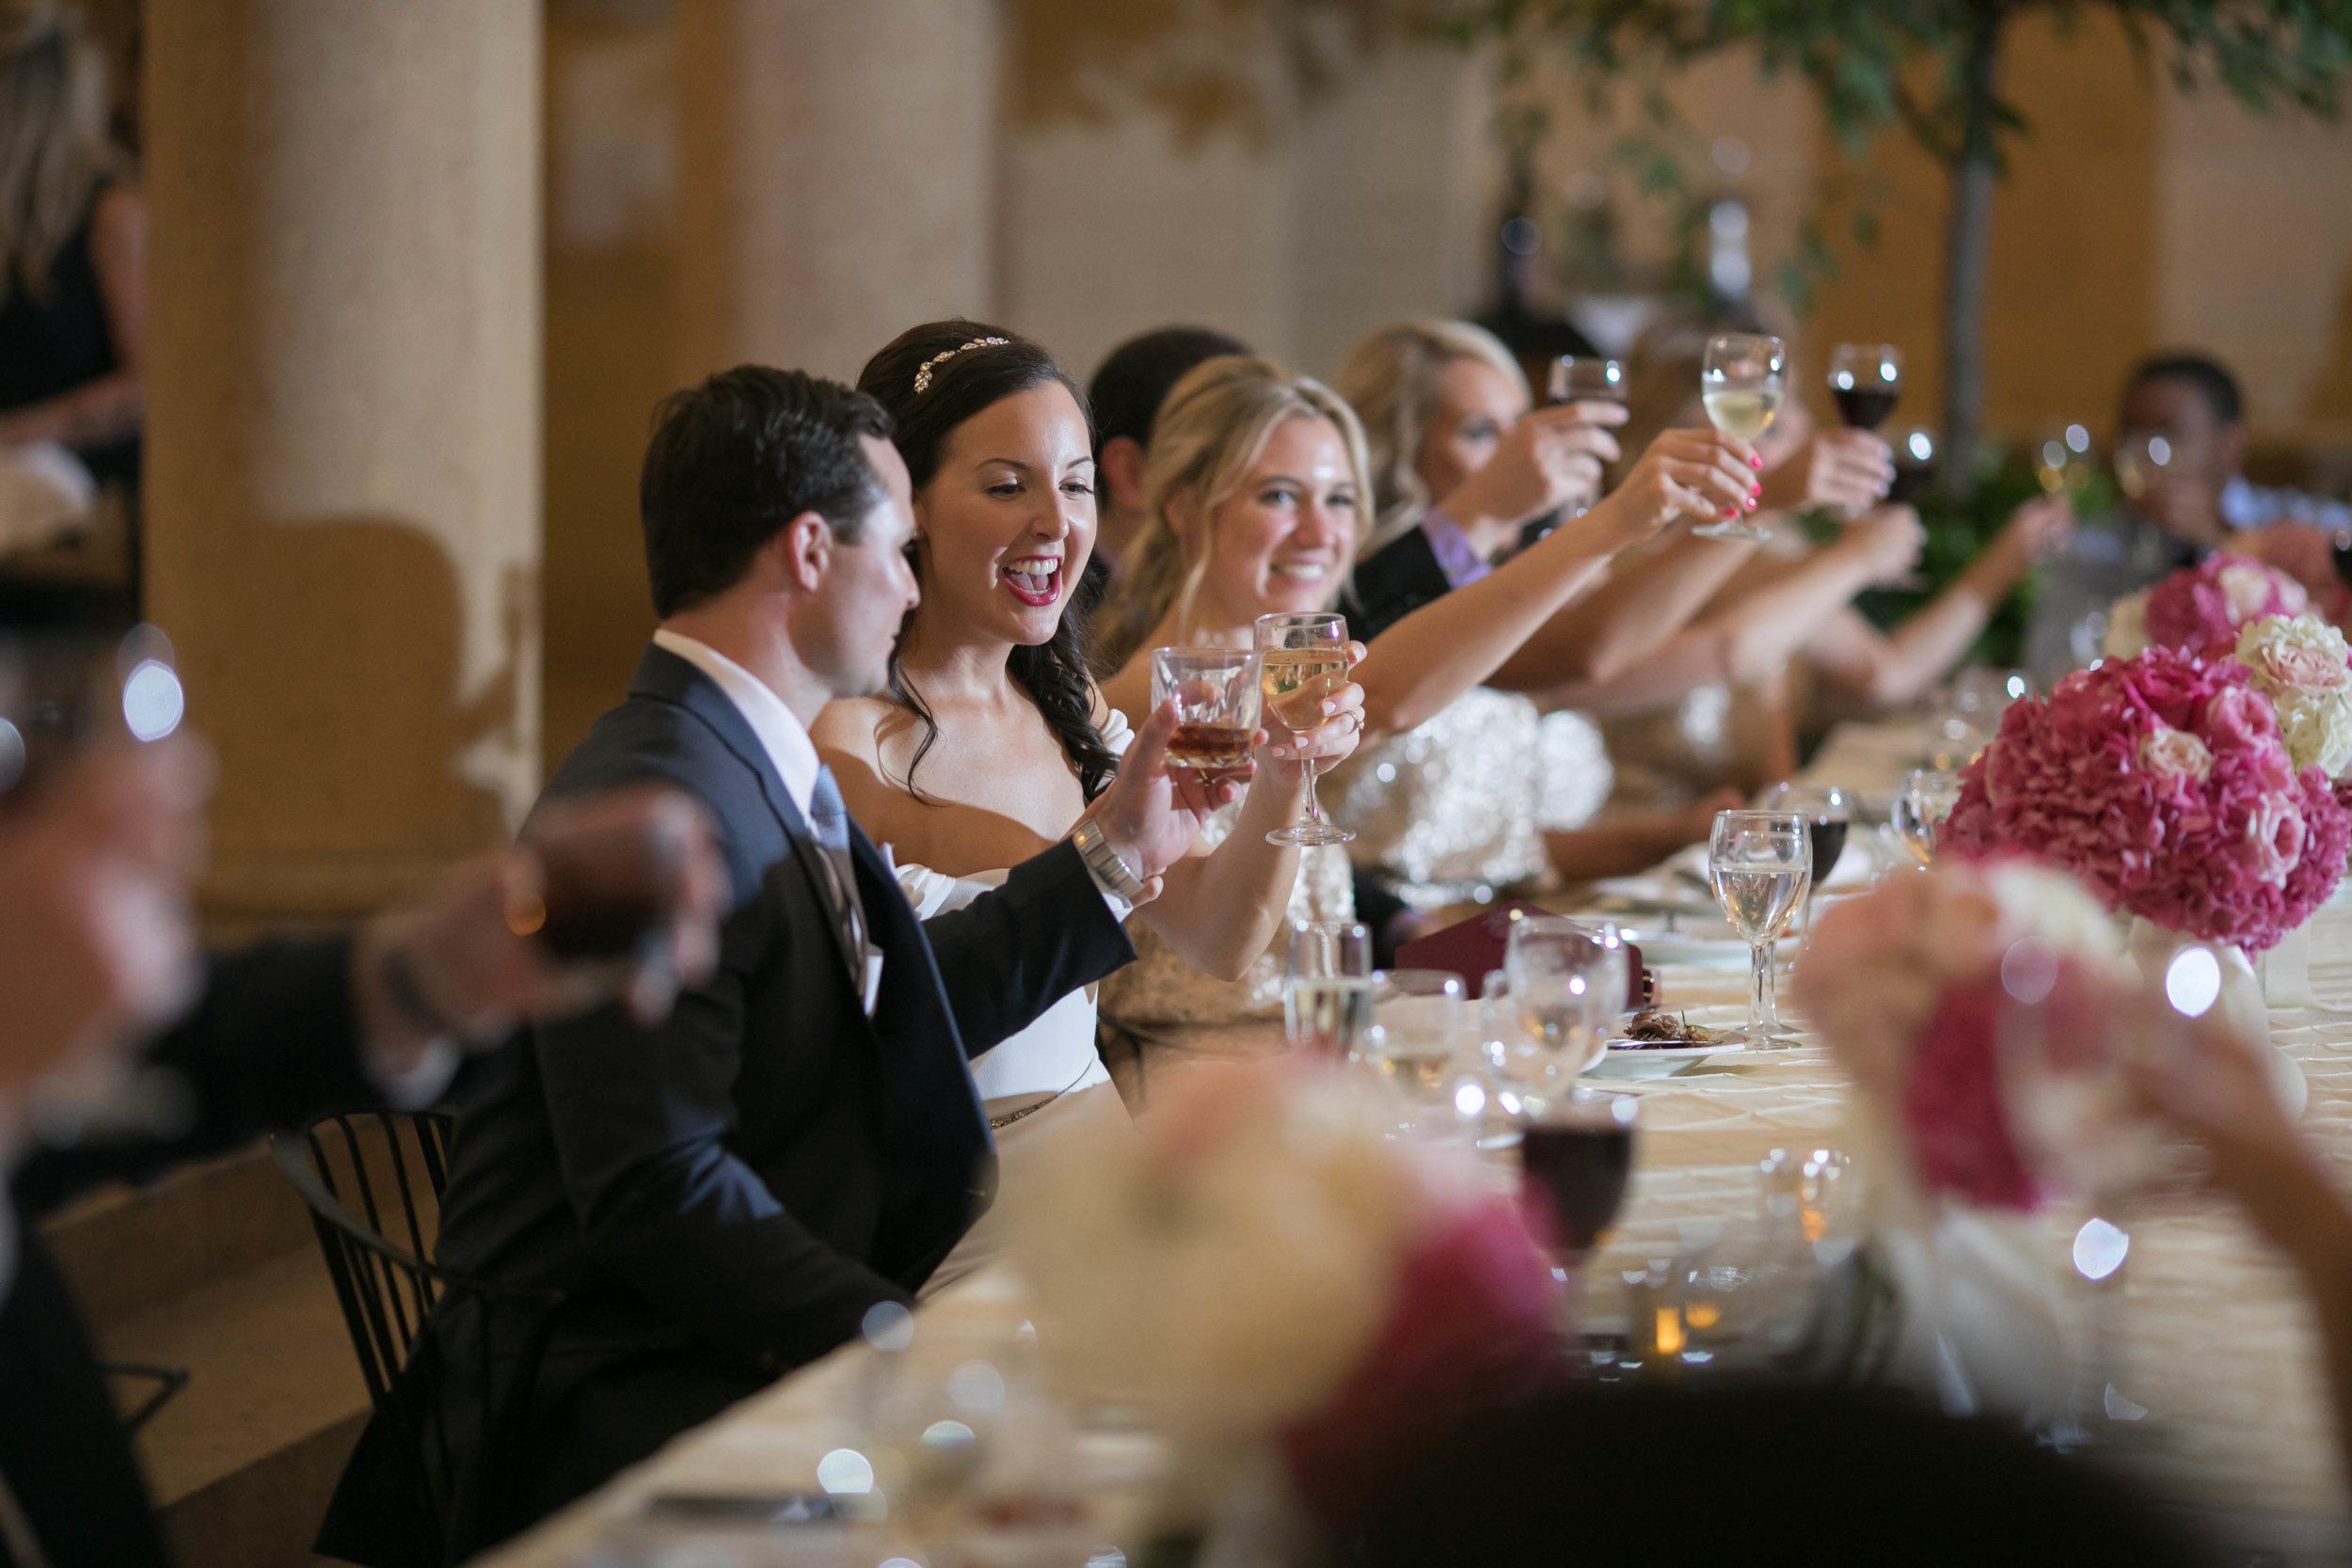 nelson-atkins-wedding-75.jpg